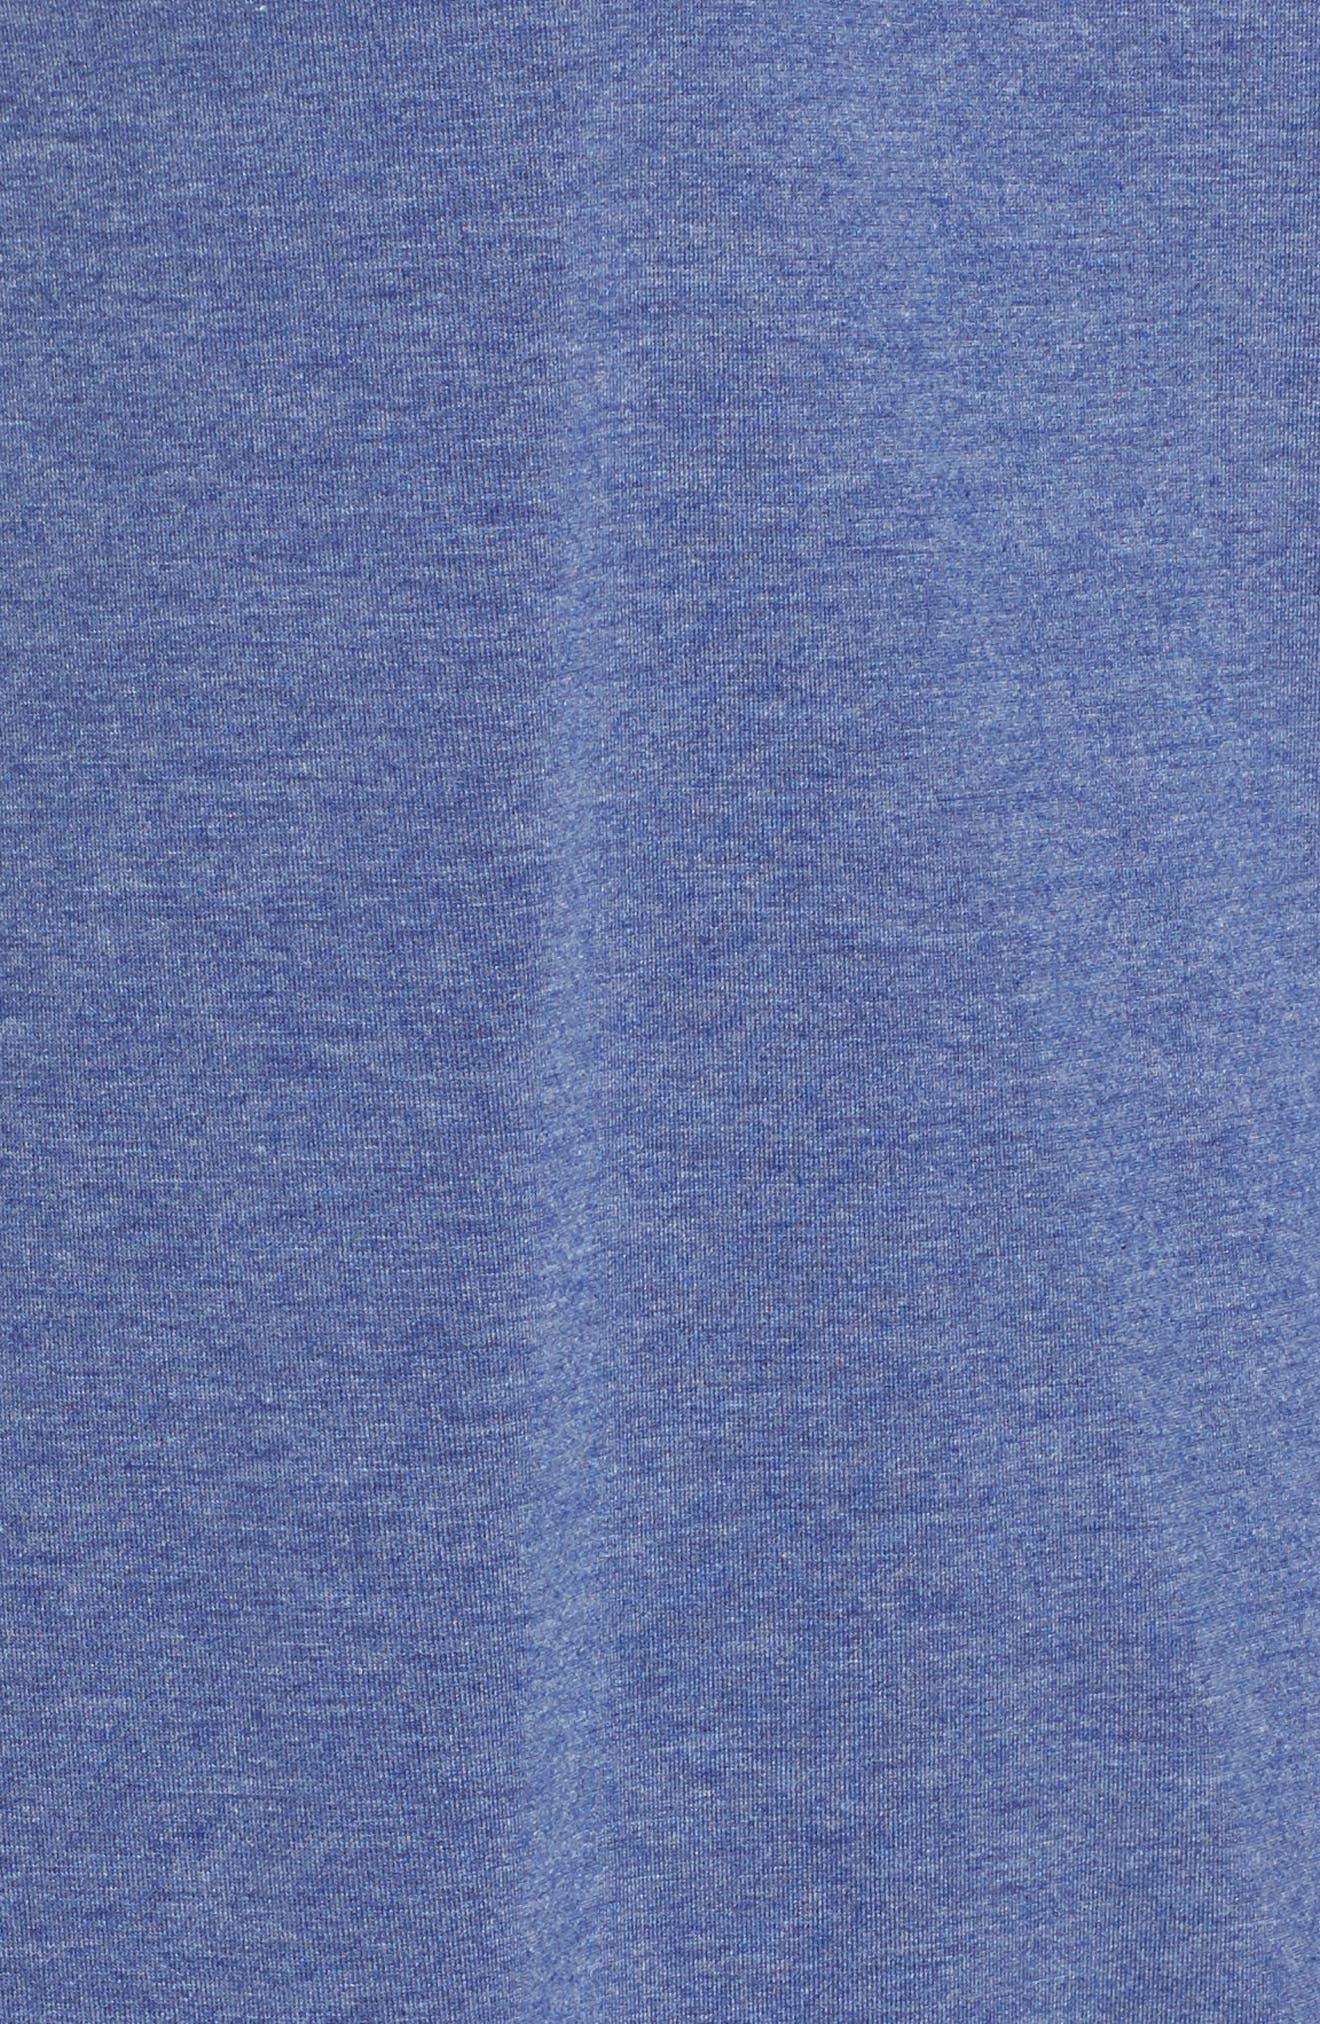 Honeydew All American Sleep Shirt,                             Alternate thumbnail 32, color,